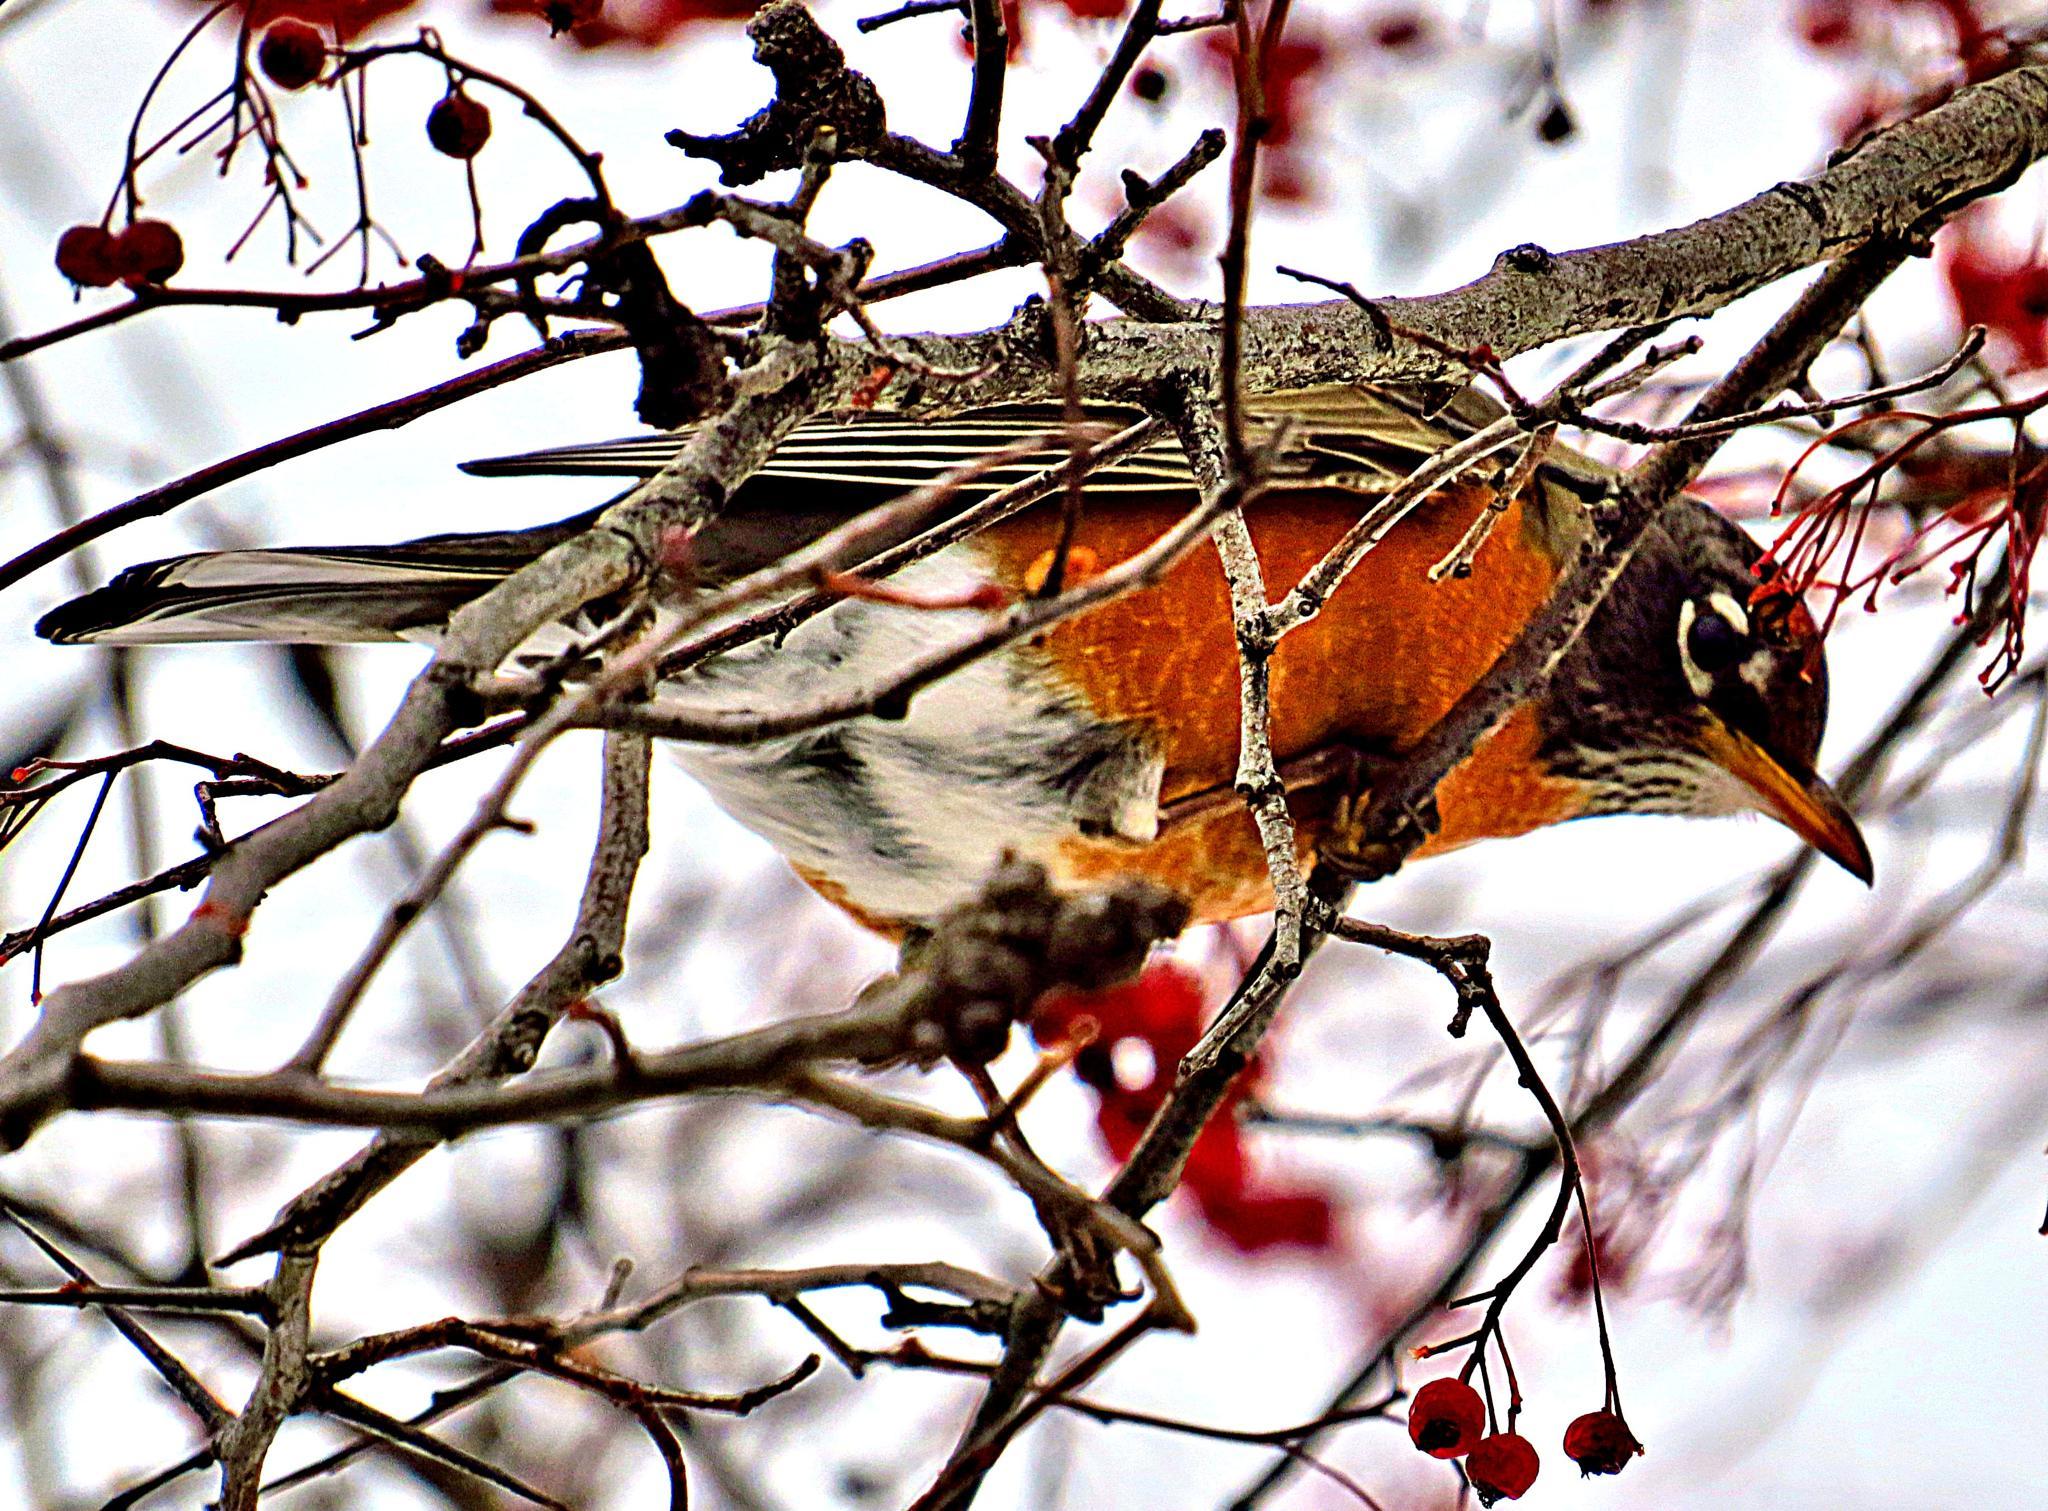 American Robin by pennieawhite